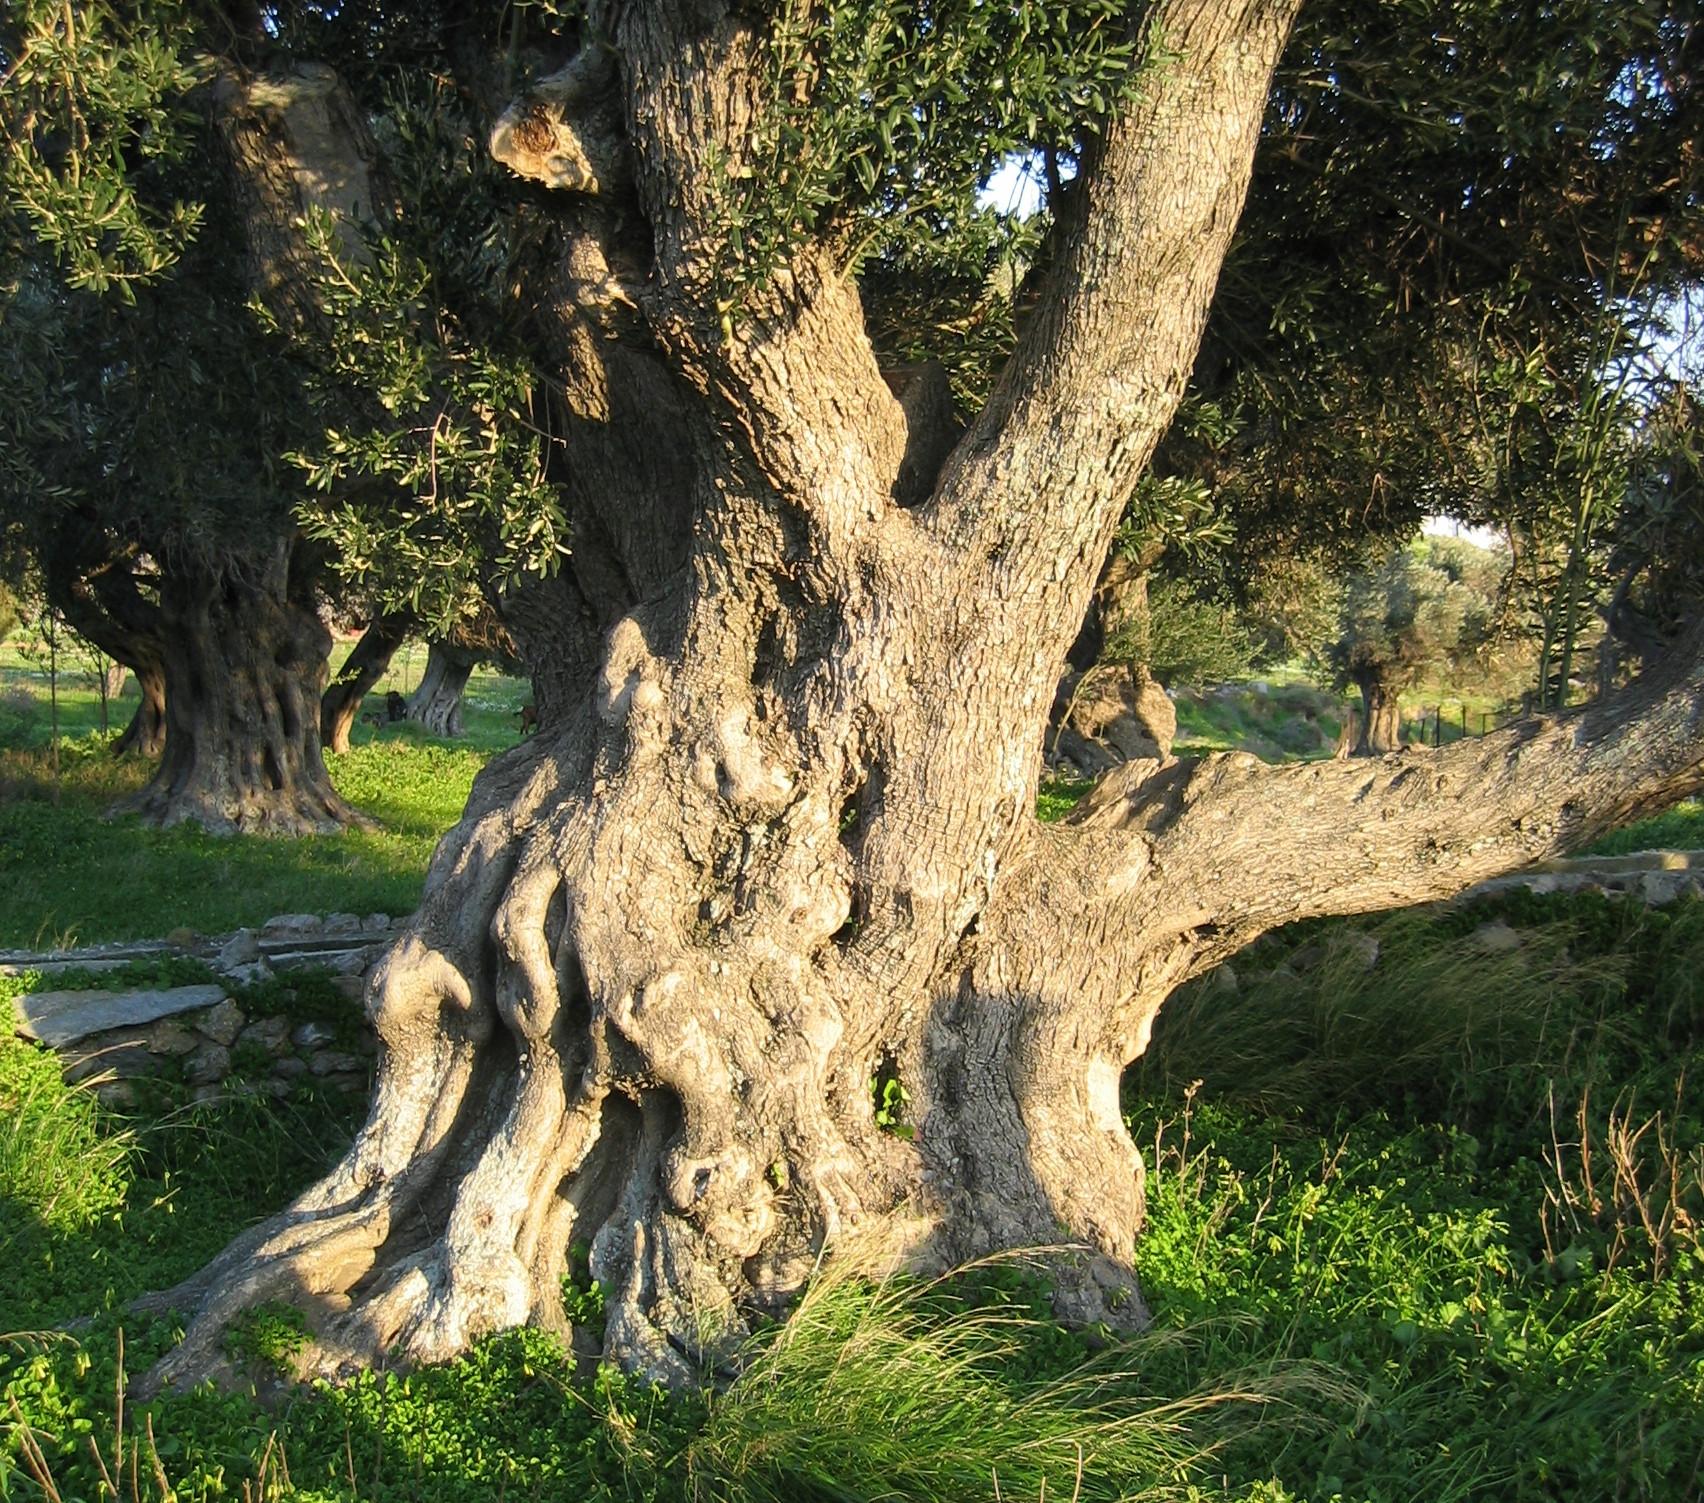 Altehrwüdiger Olivenbaum in Karystos, Griechenland. Foto: Tim Bekaert